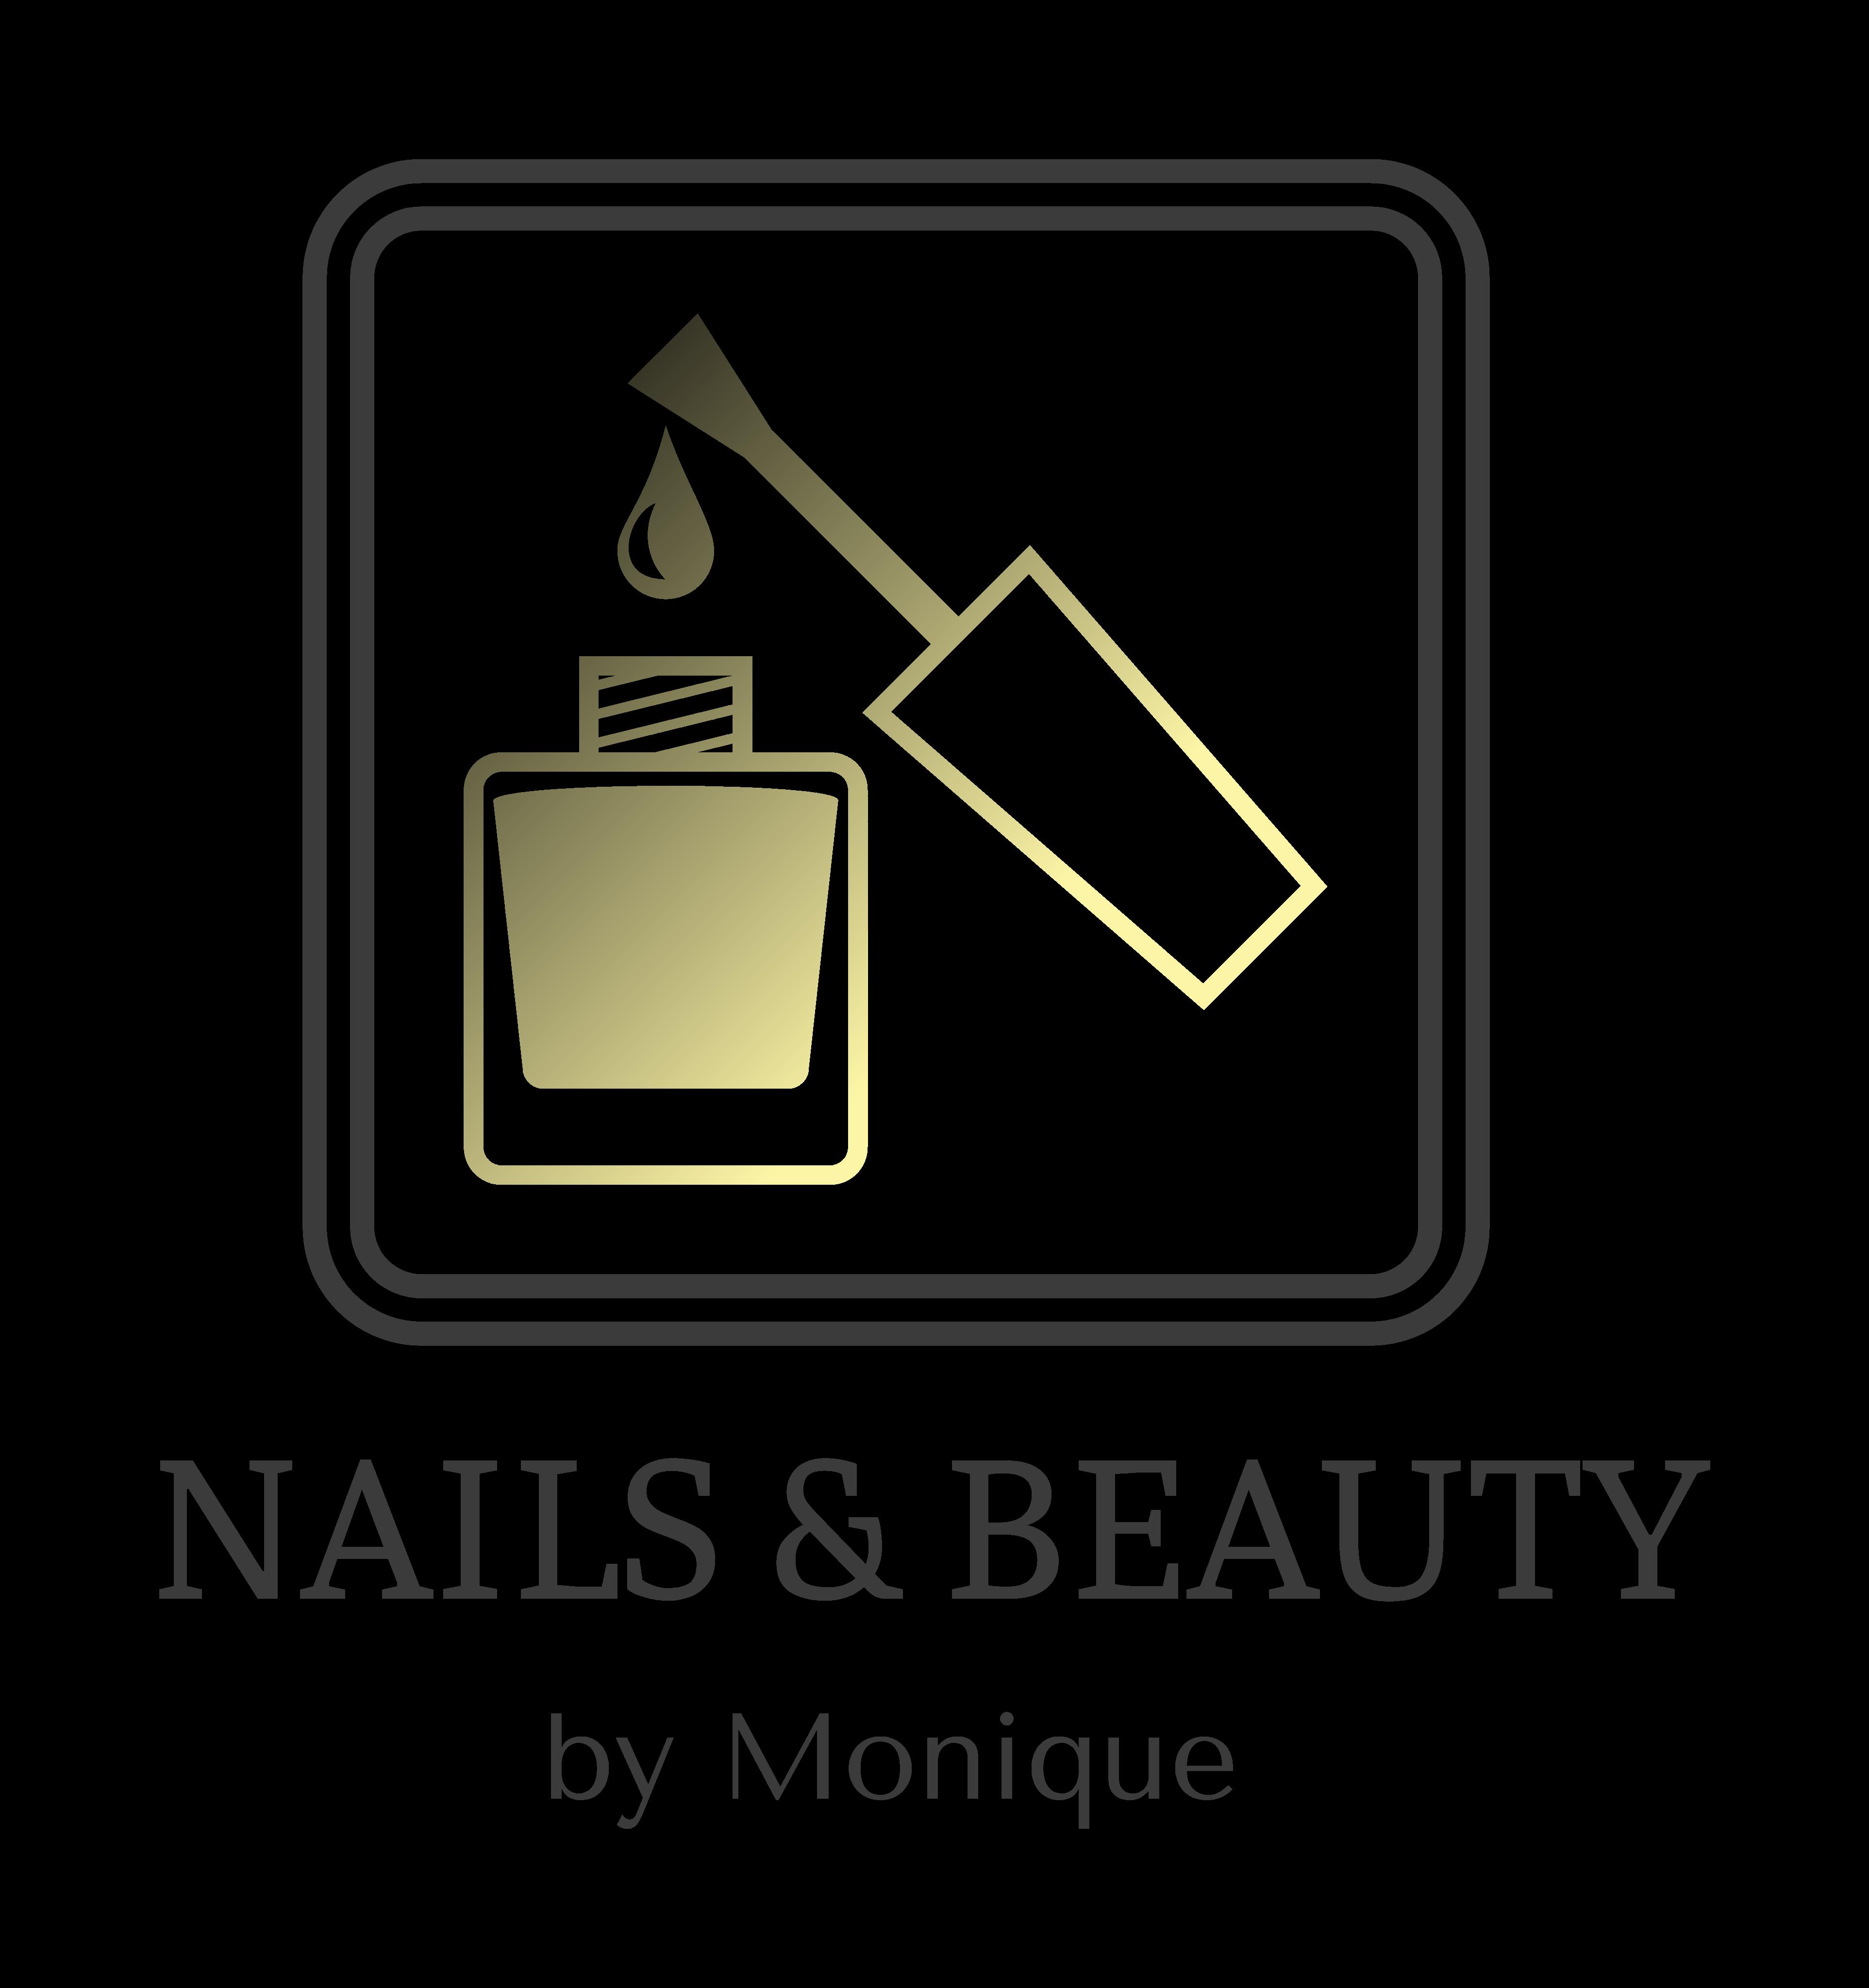 Nails-beautybymonique.nl